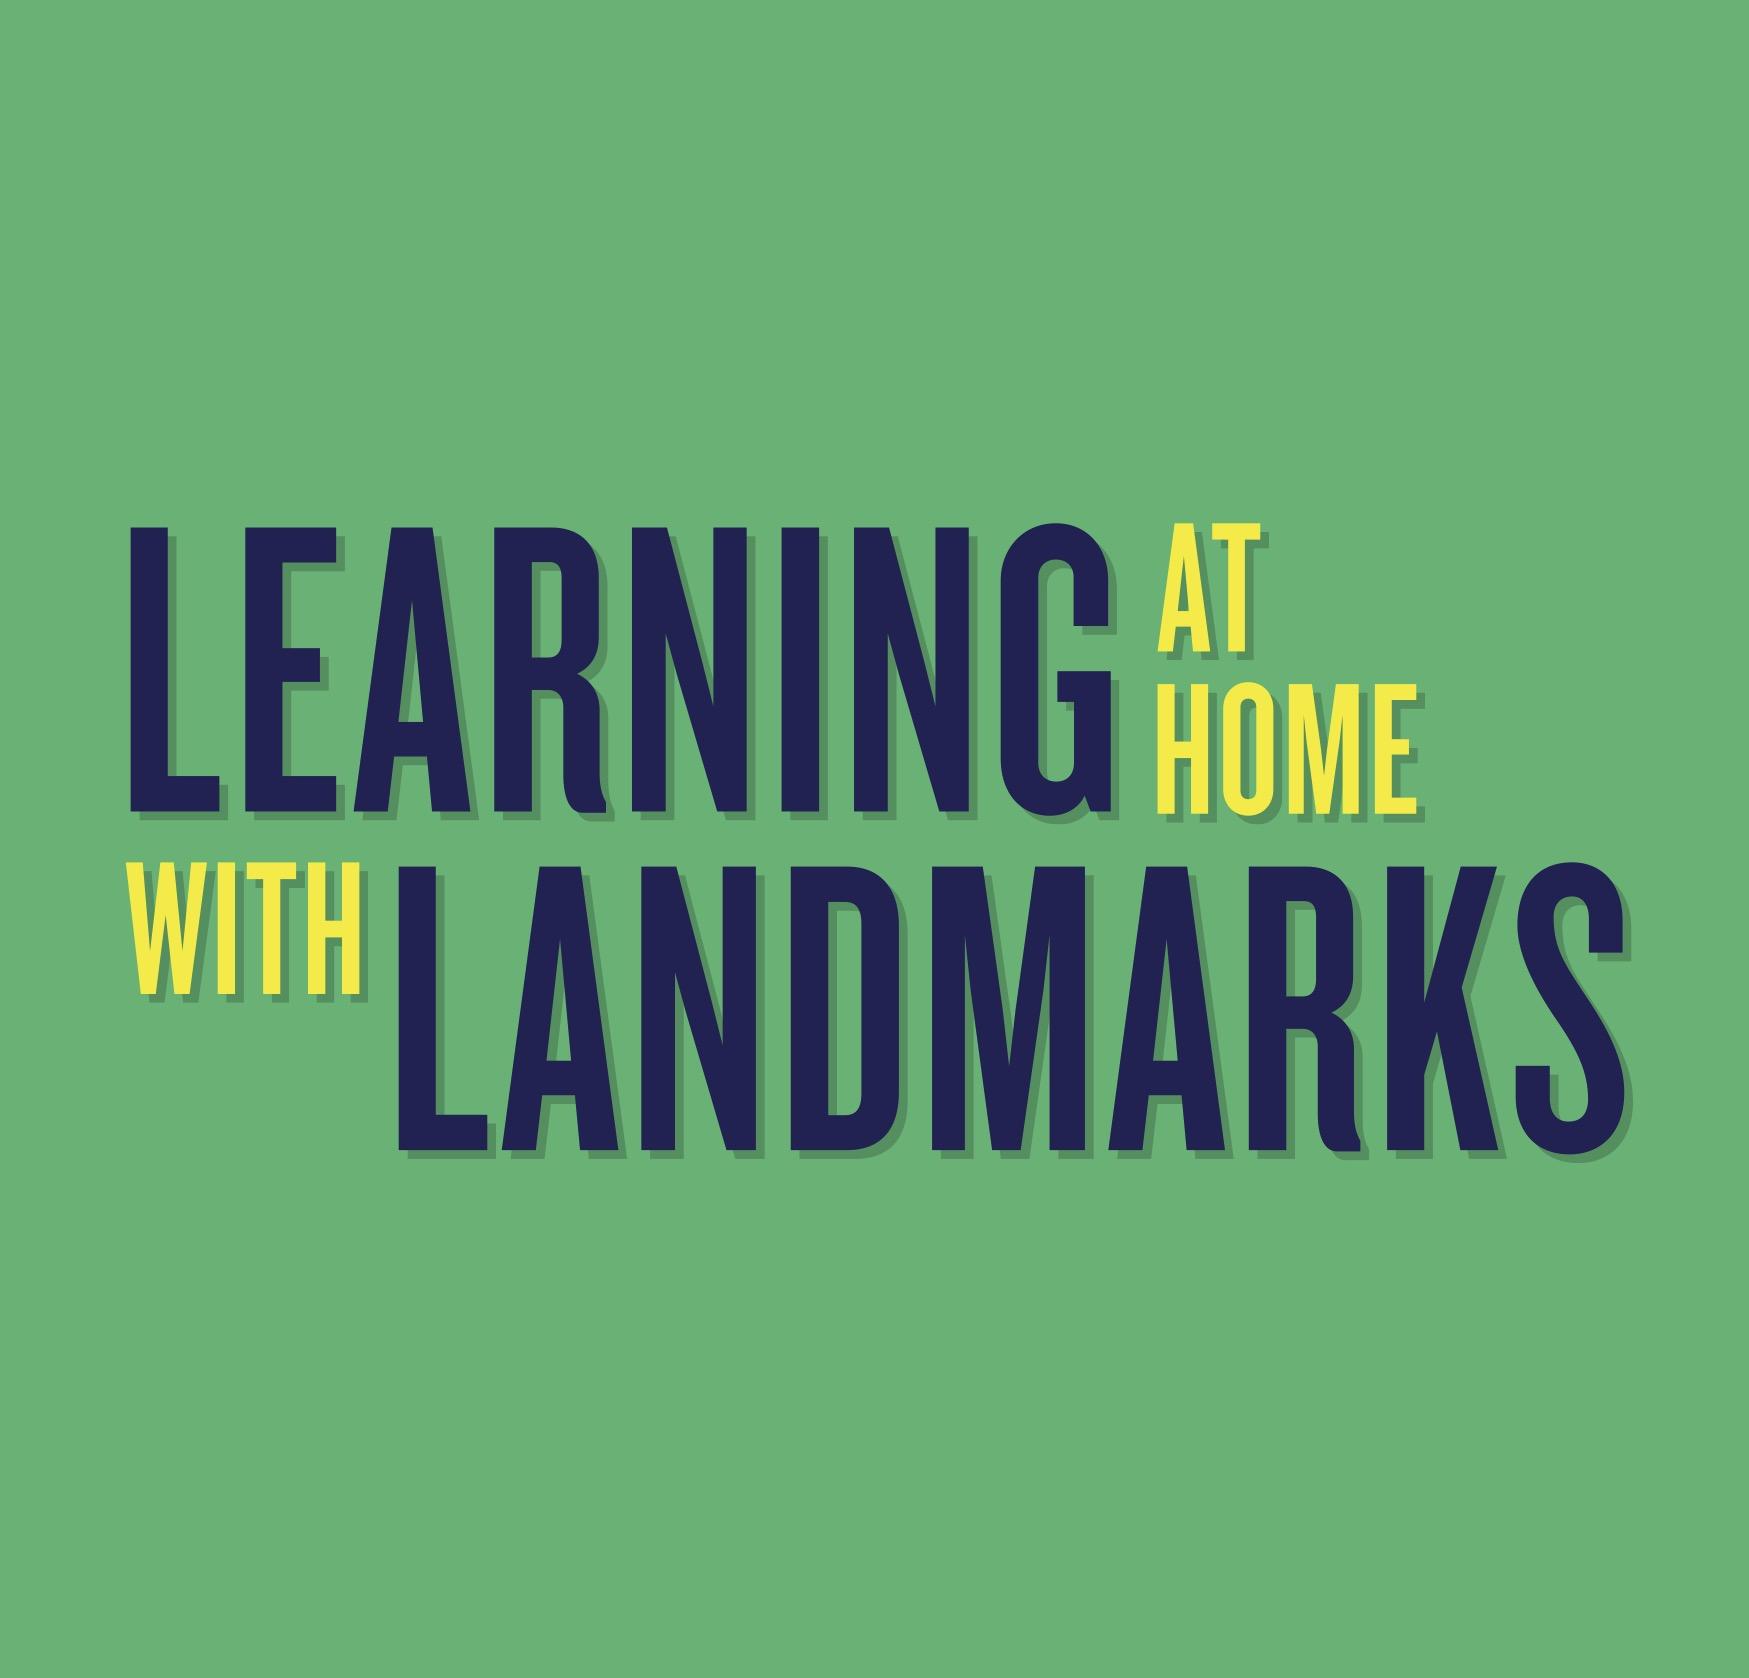 University of Texas Landmarks - Represents learningathomewithlandmarks v1 0